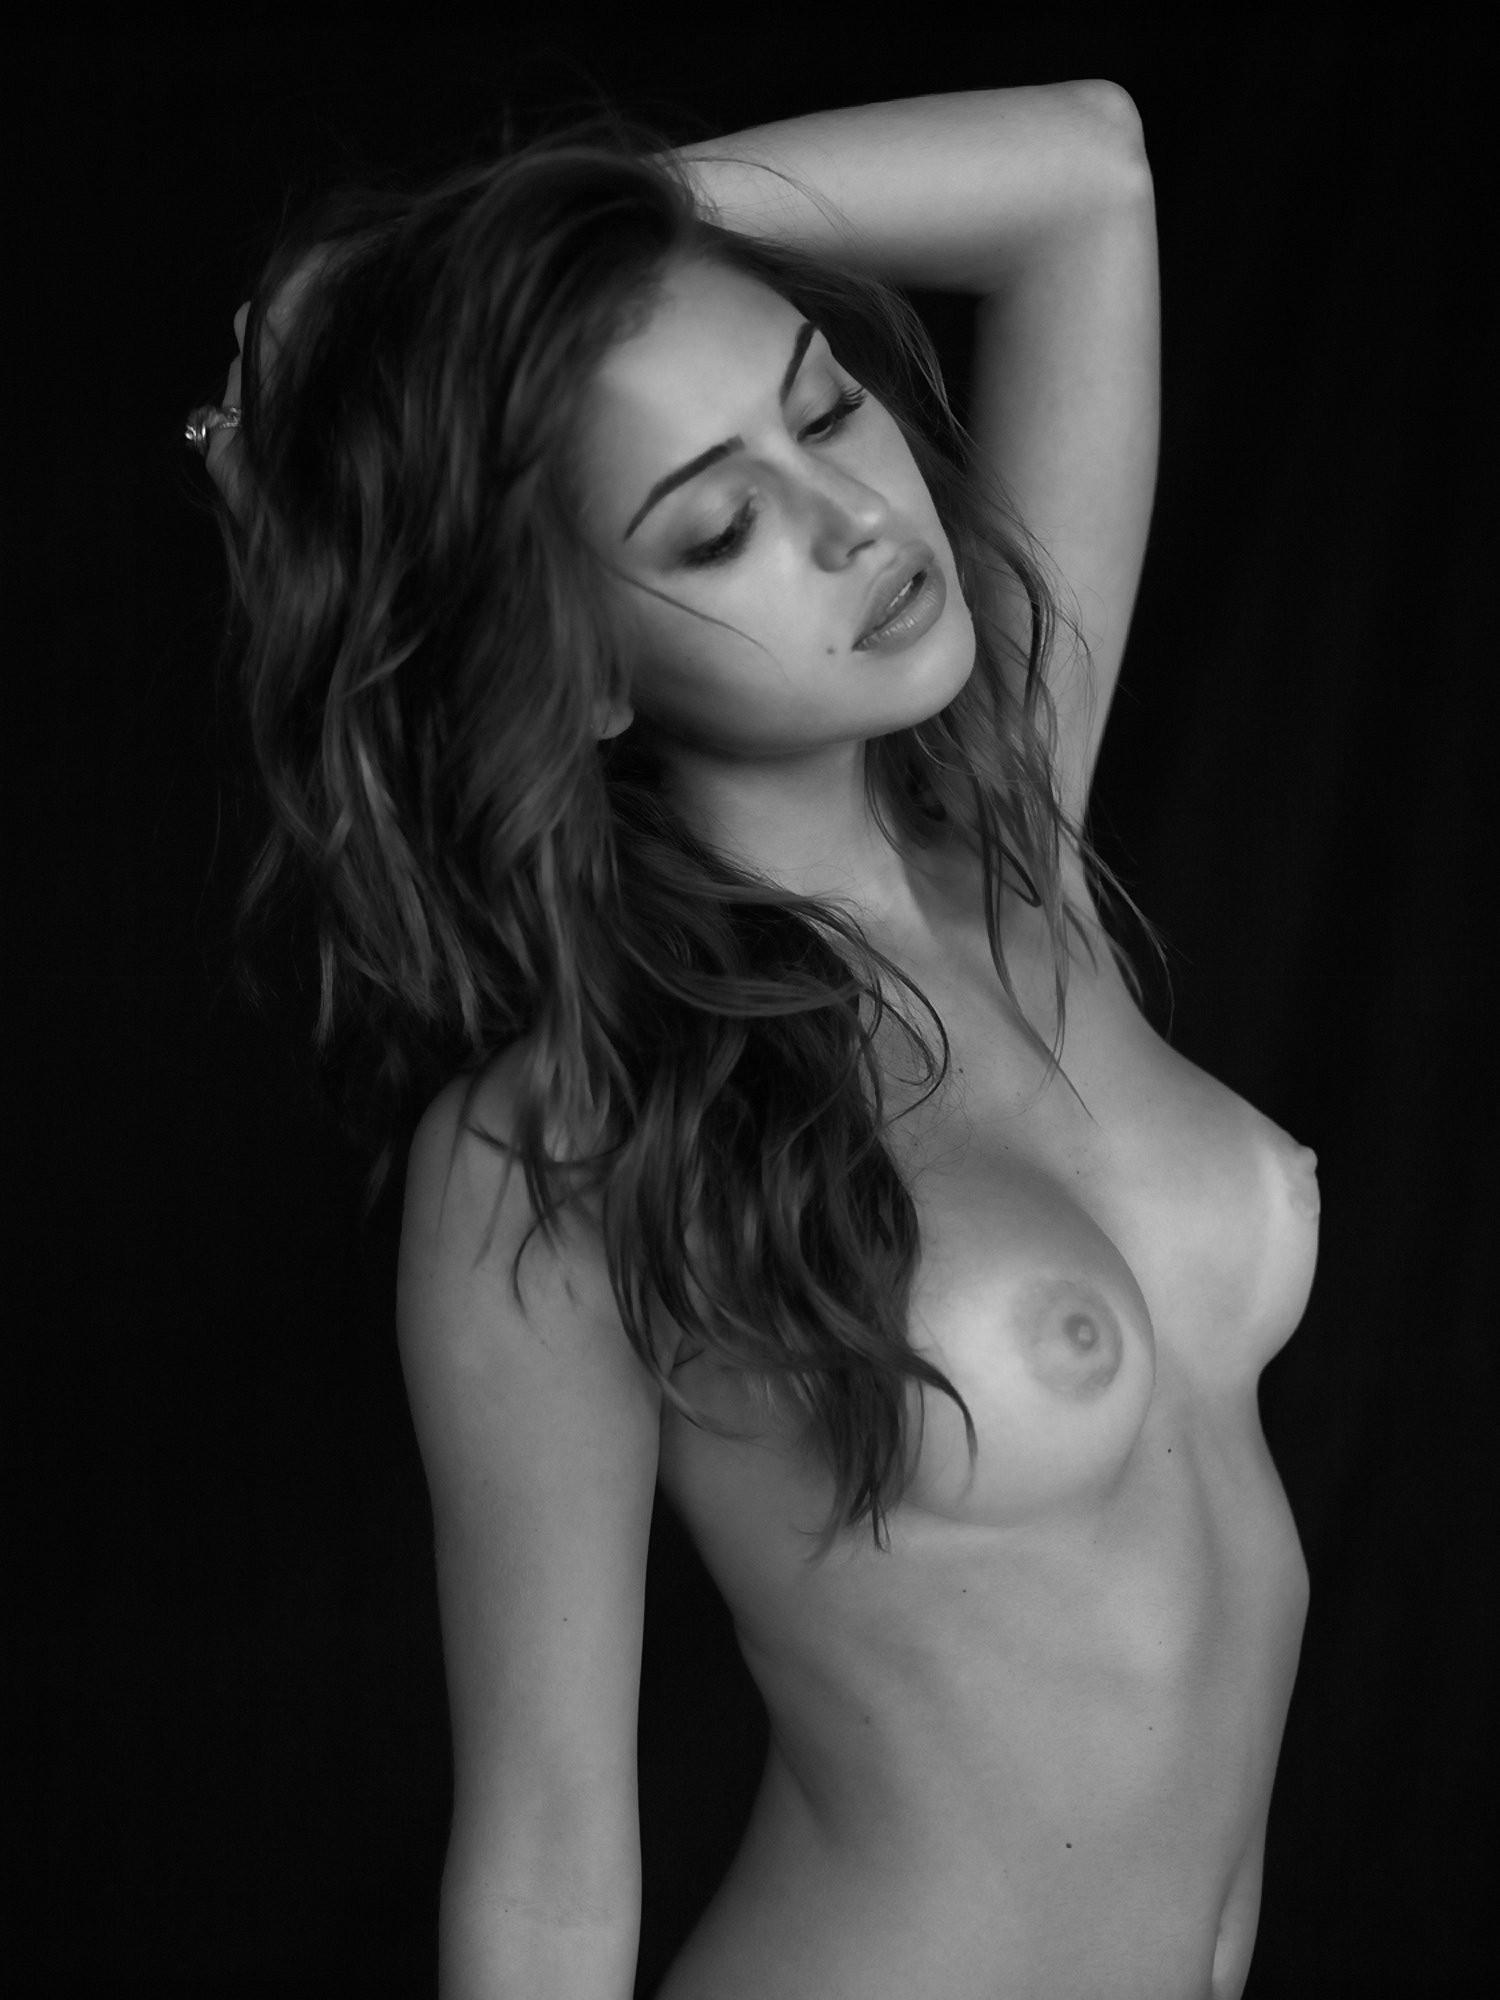 nudes (65 photos), Paparazzi Celebrity image